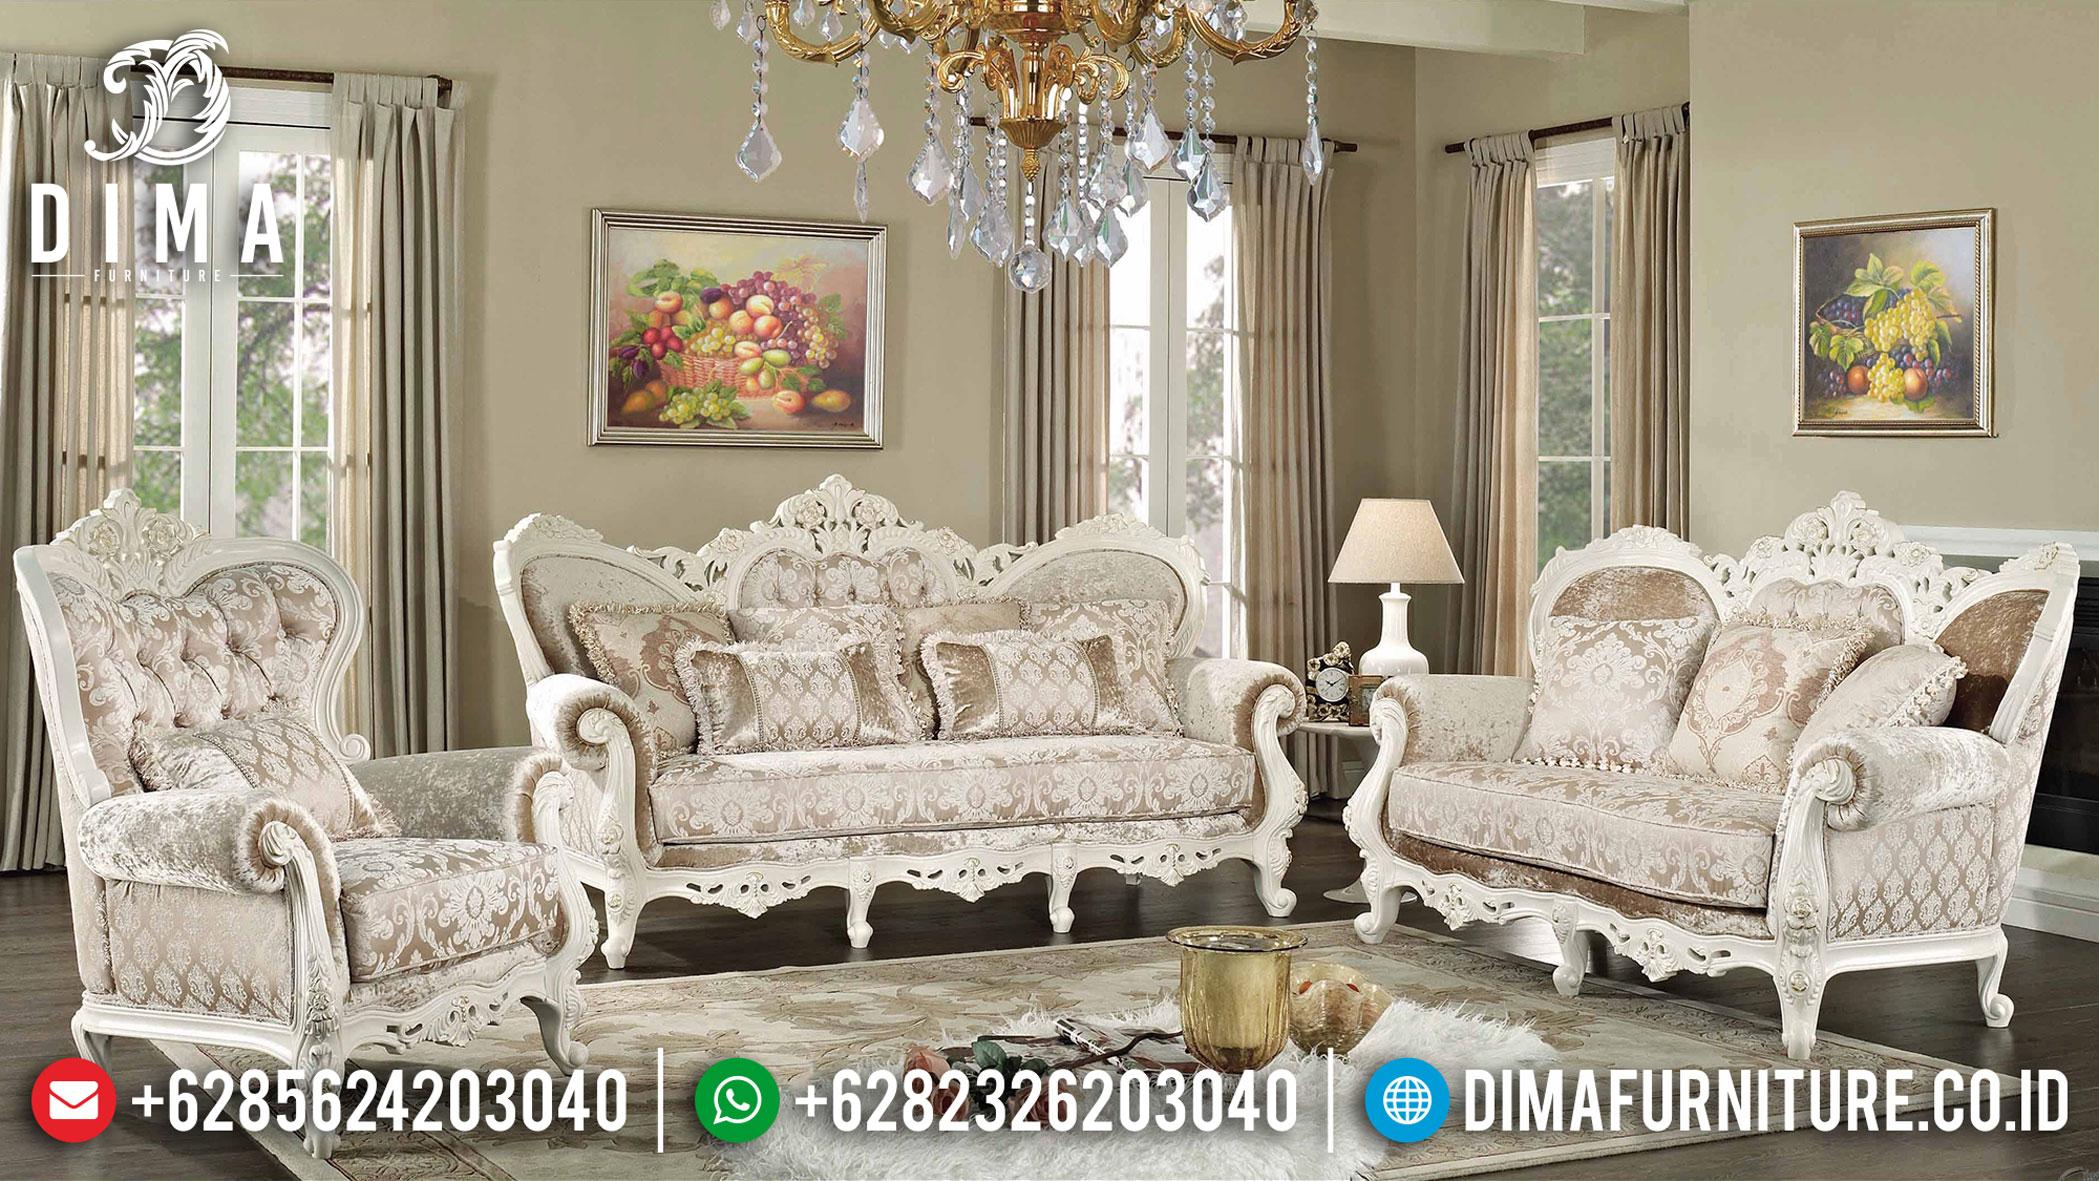 Romanian Sofa Tamu Ukir Jepara Luxury Classic White Satin Furniture Jepara TTJ-1039